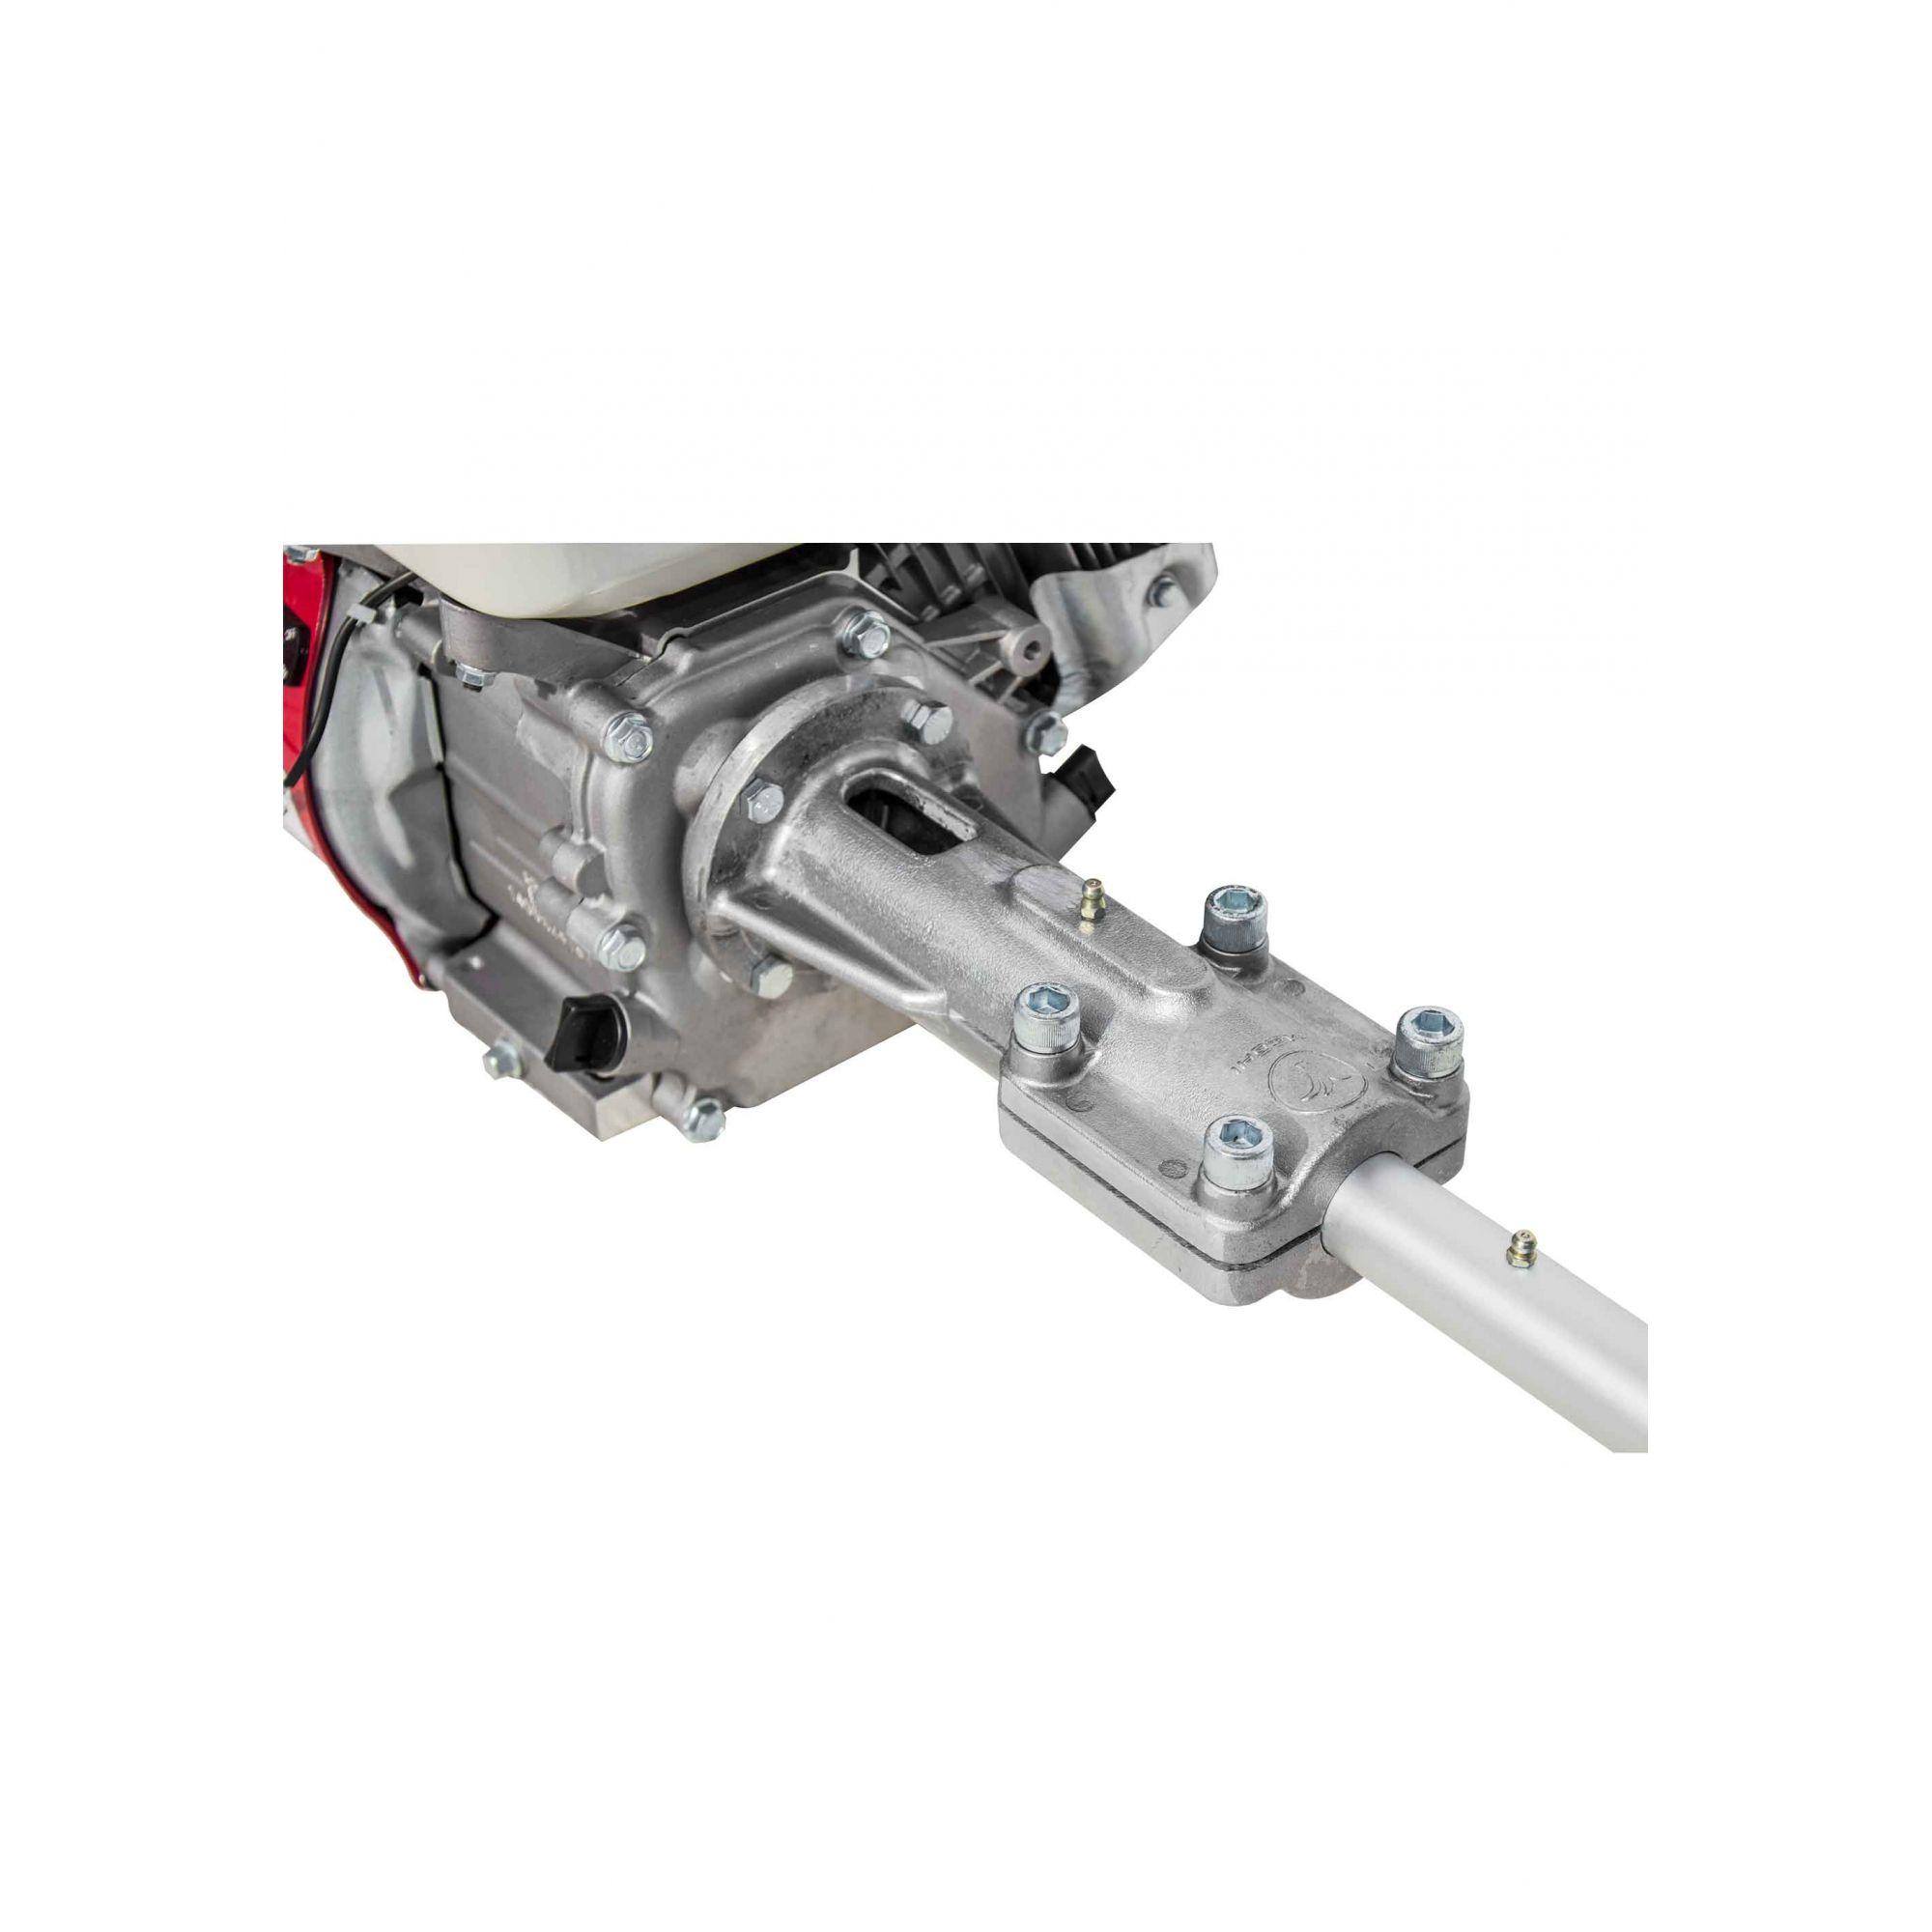 Kit Motor De Centro Barco Bote 1,70mt P/ Motor 10 Die/13 Gas